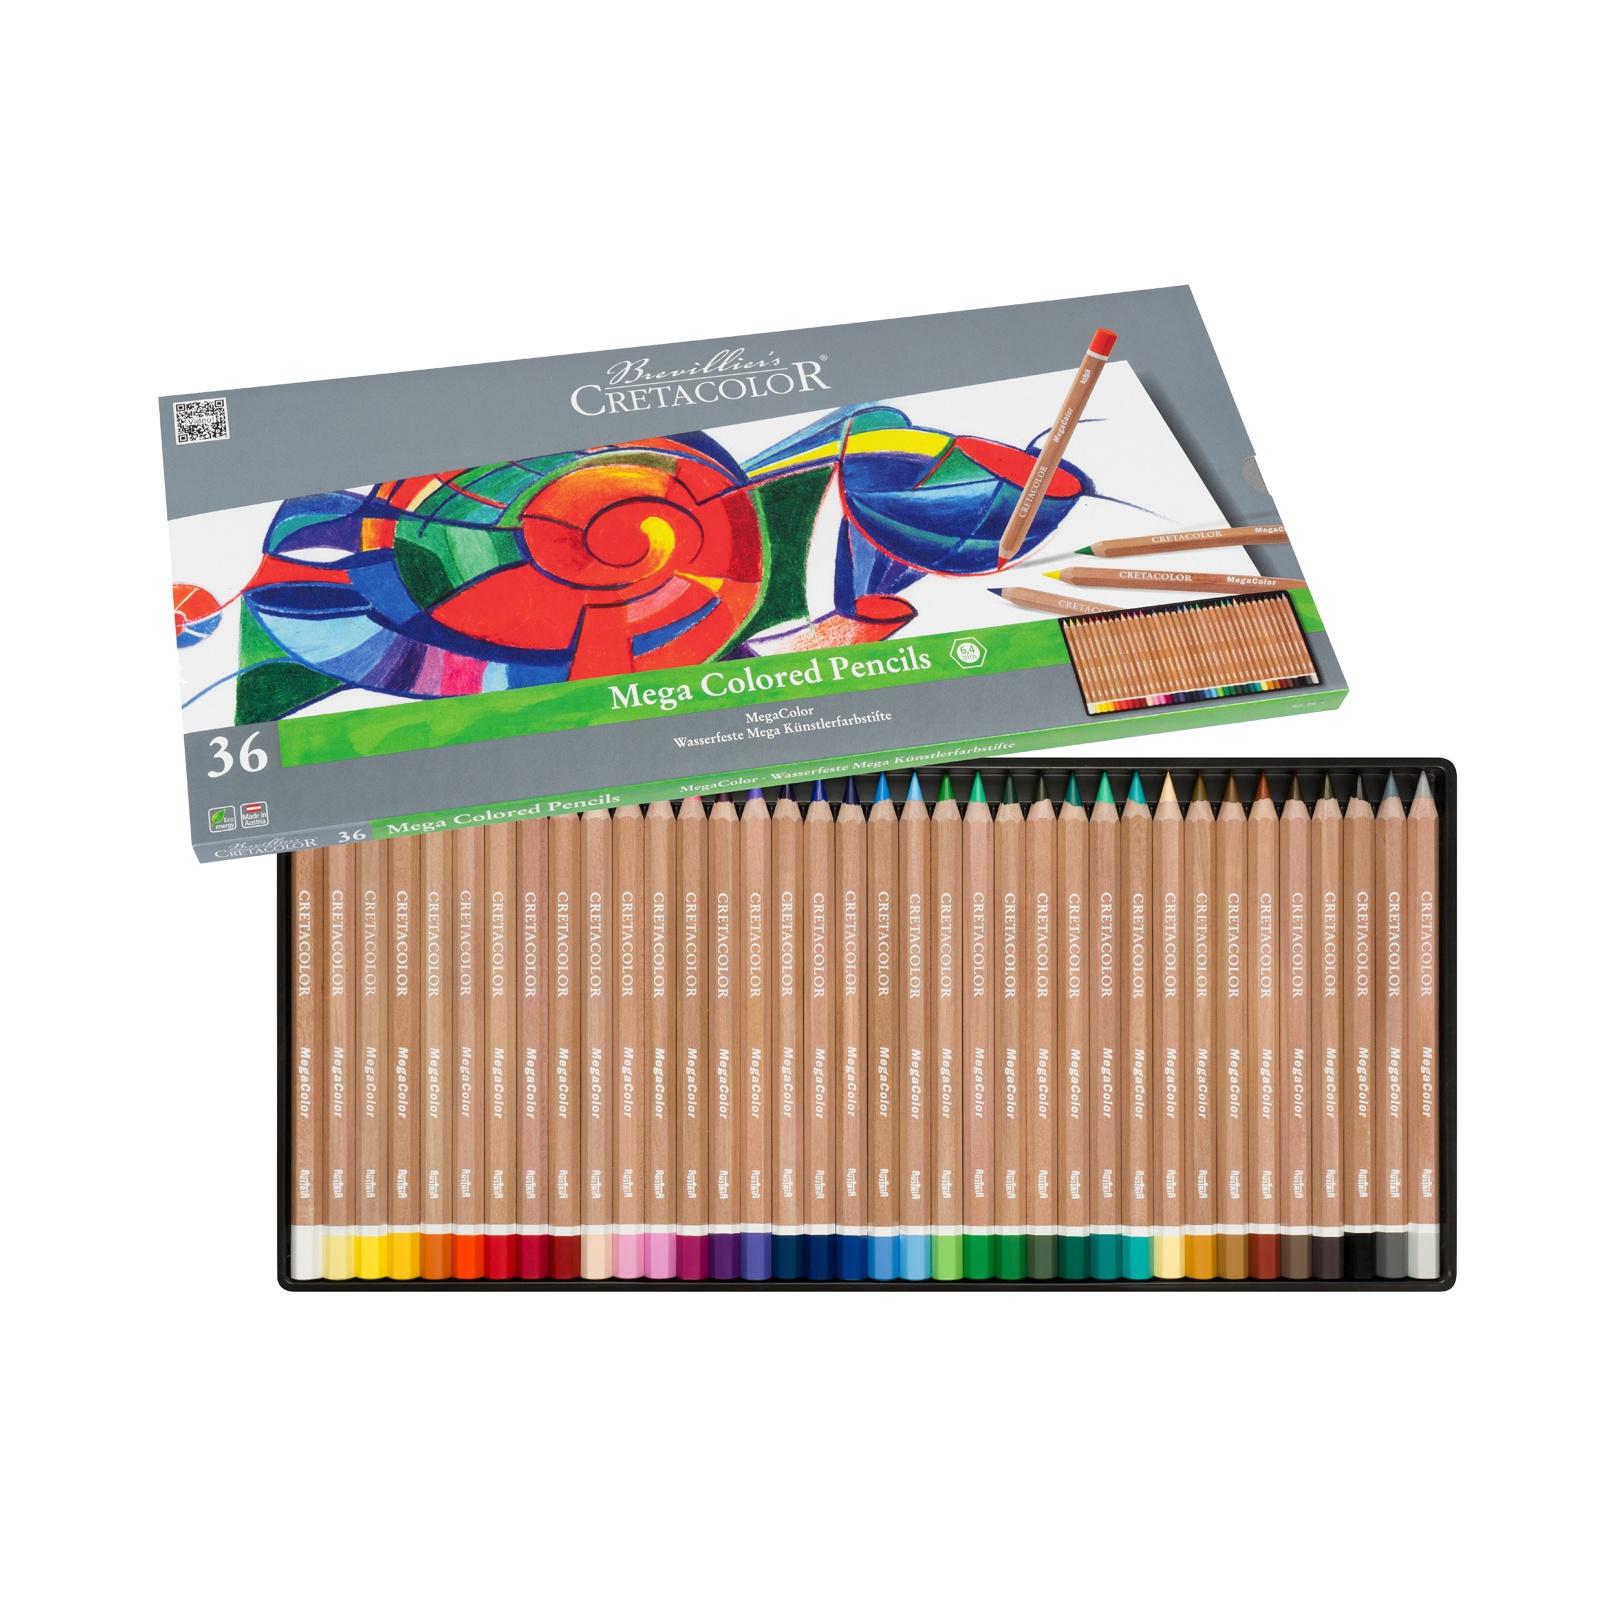 MegaColor Colored Pencil Sets